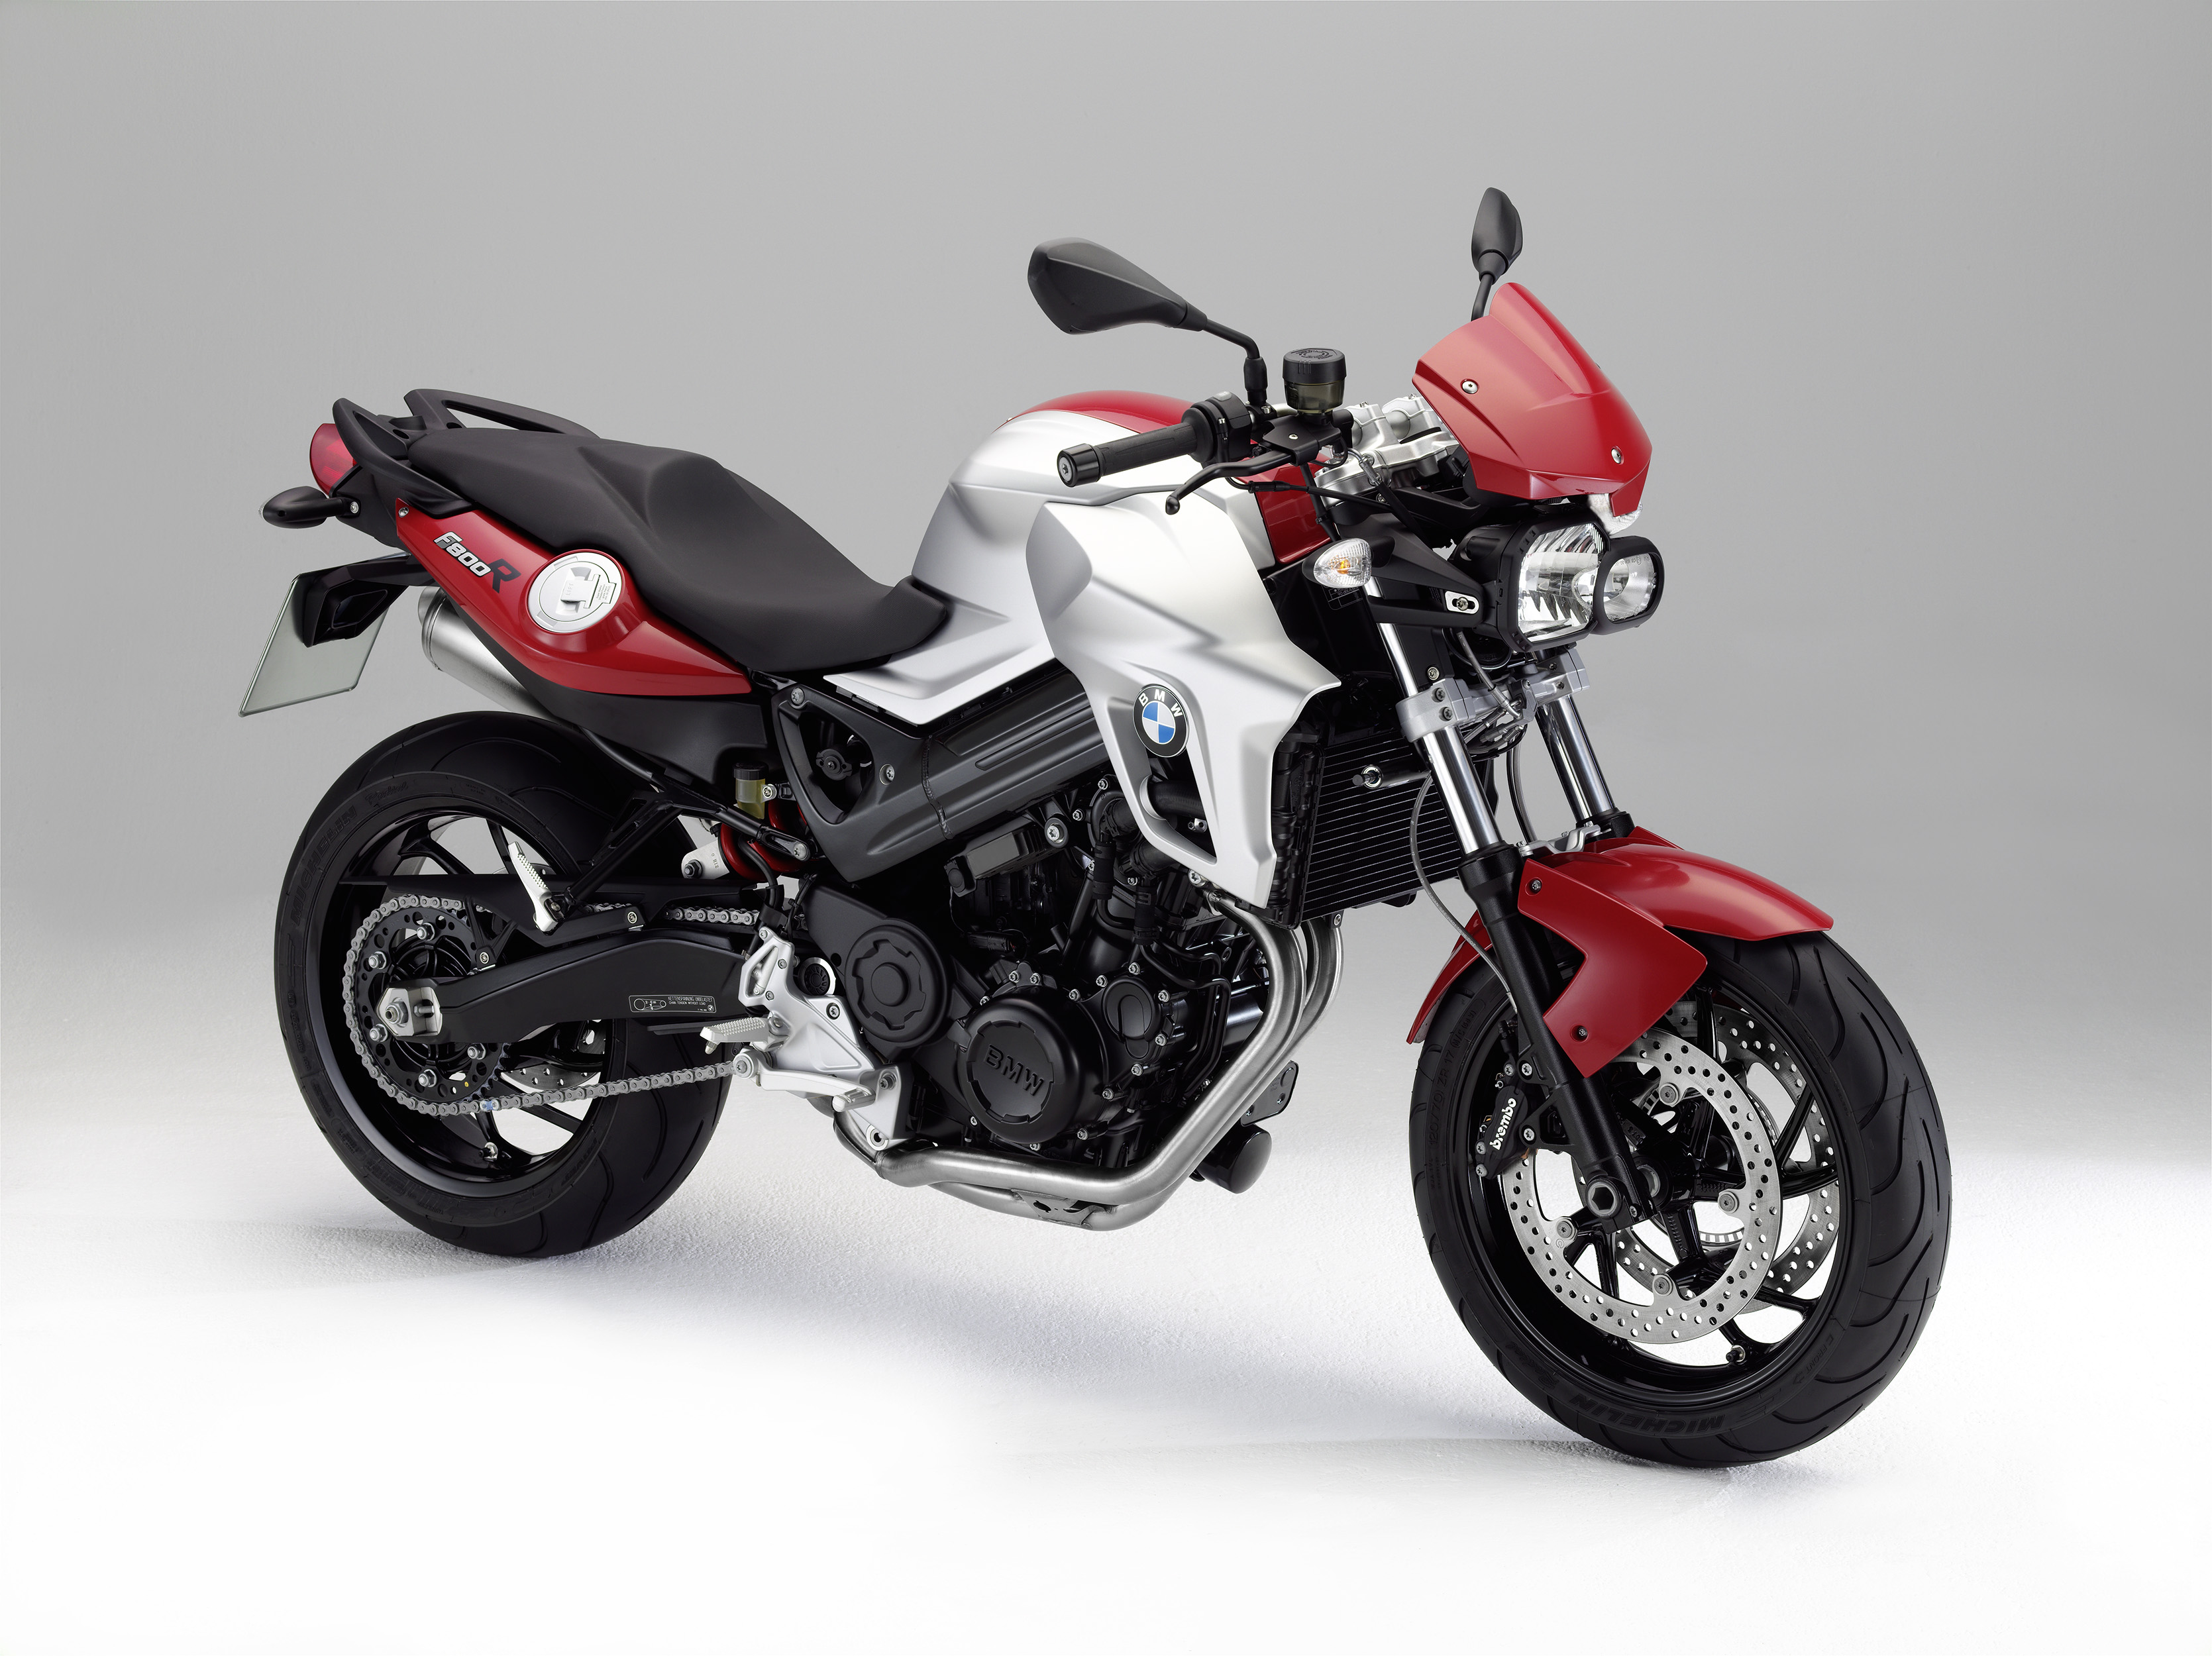 bmw f800r novelties by bmw motorrad 2012 bmw motorcycle accessory hornig individual. Black Bedroom Furniture Sets. Home Design Ideas